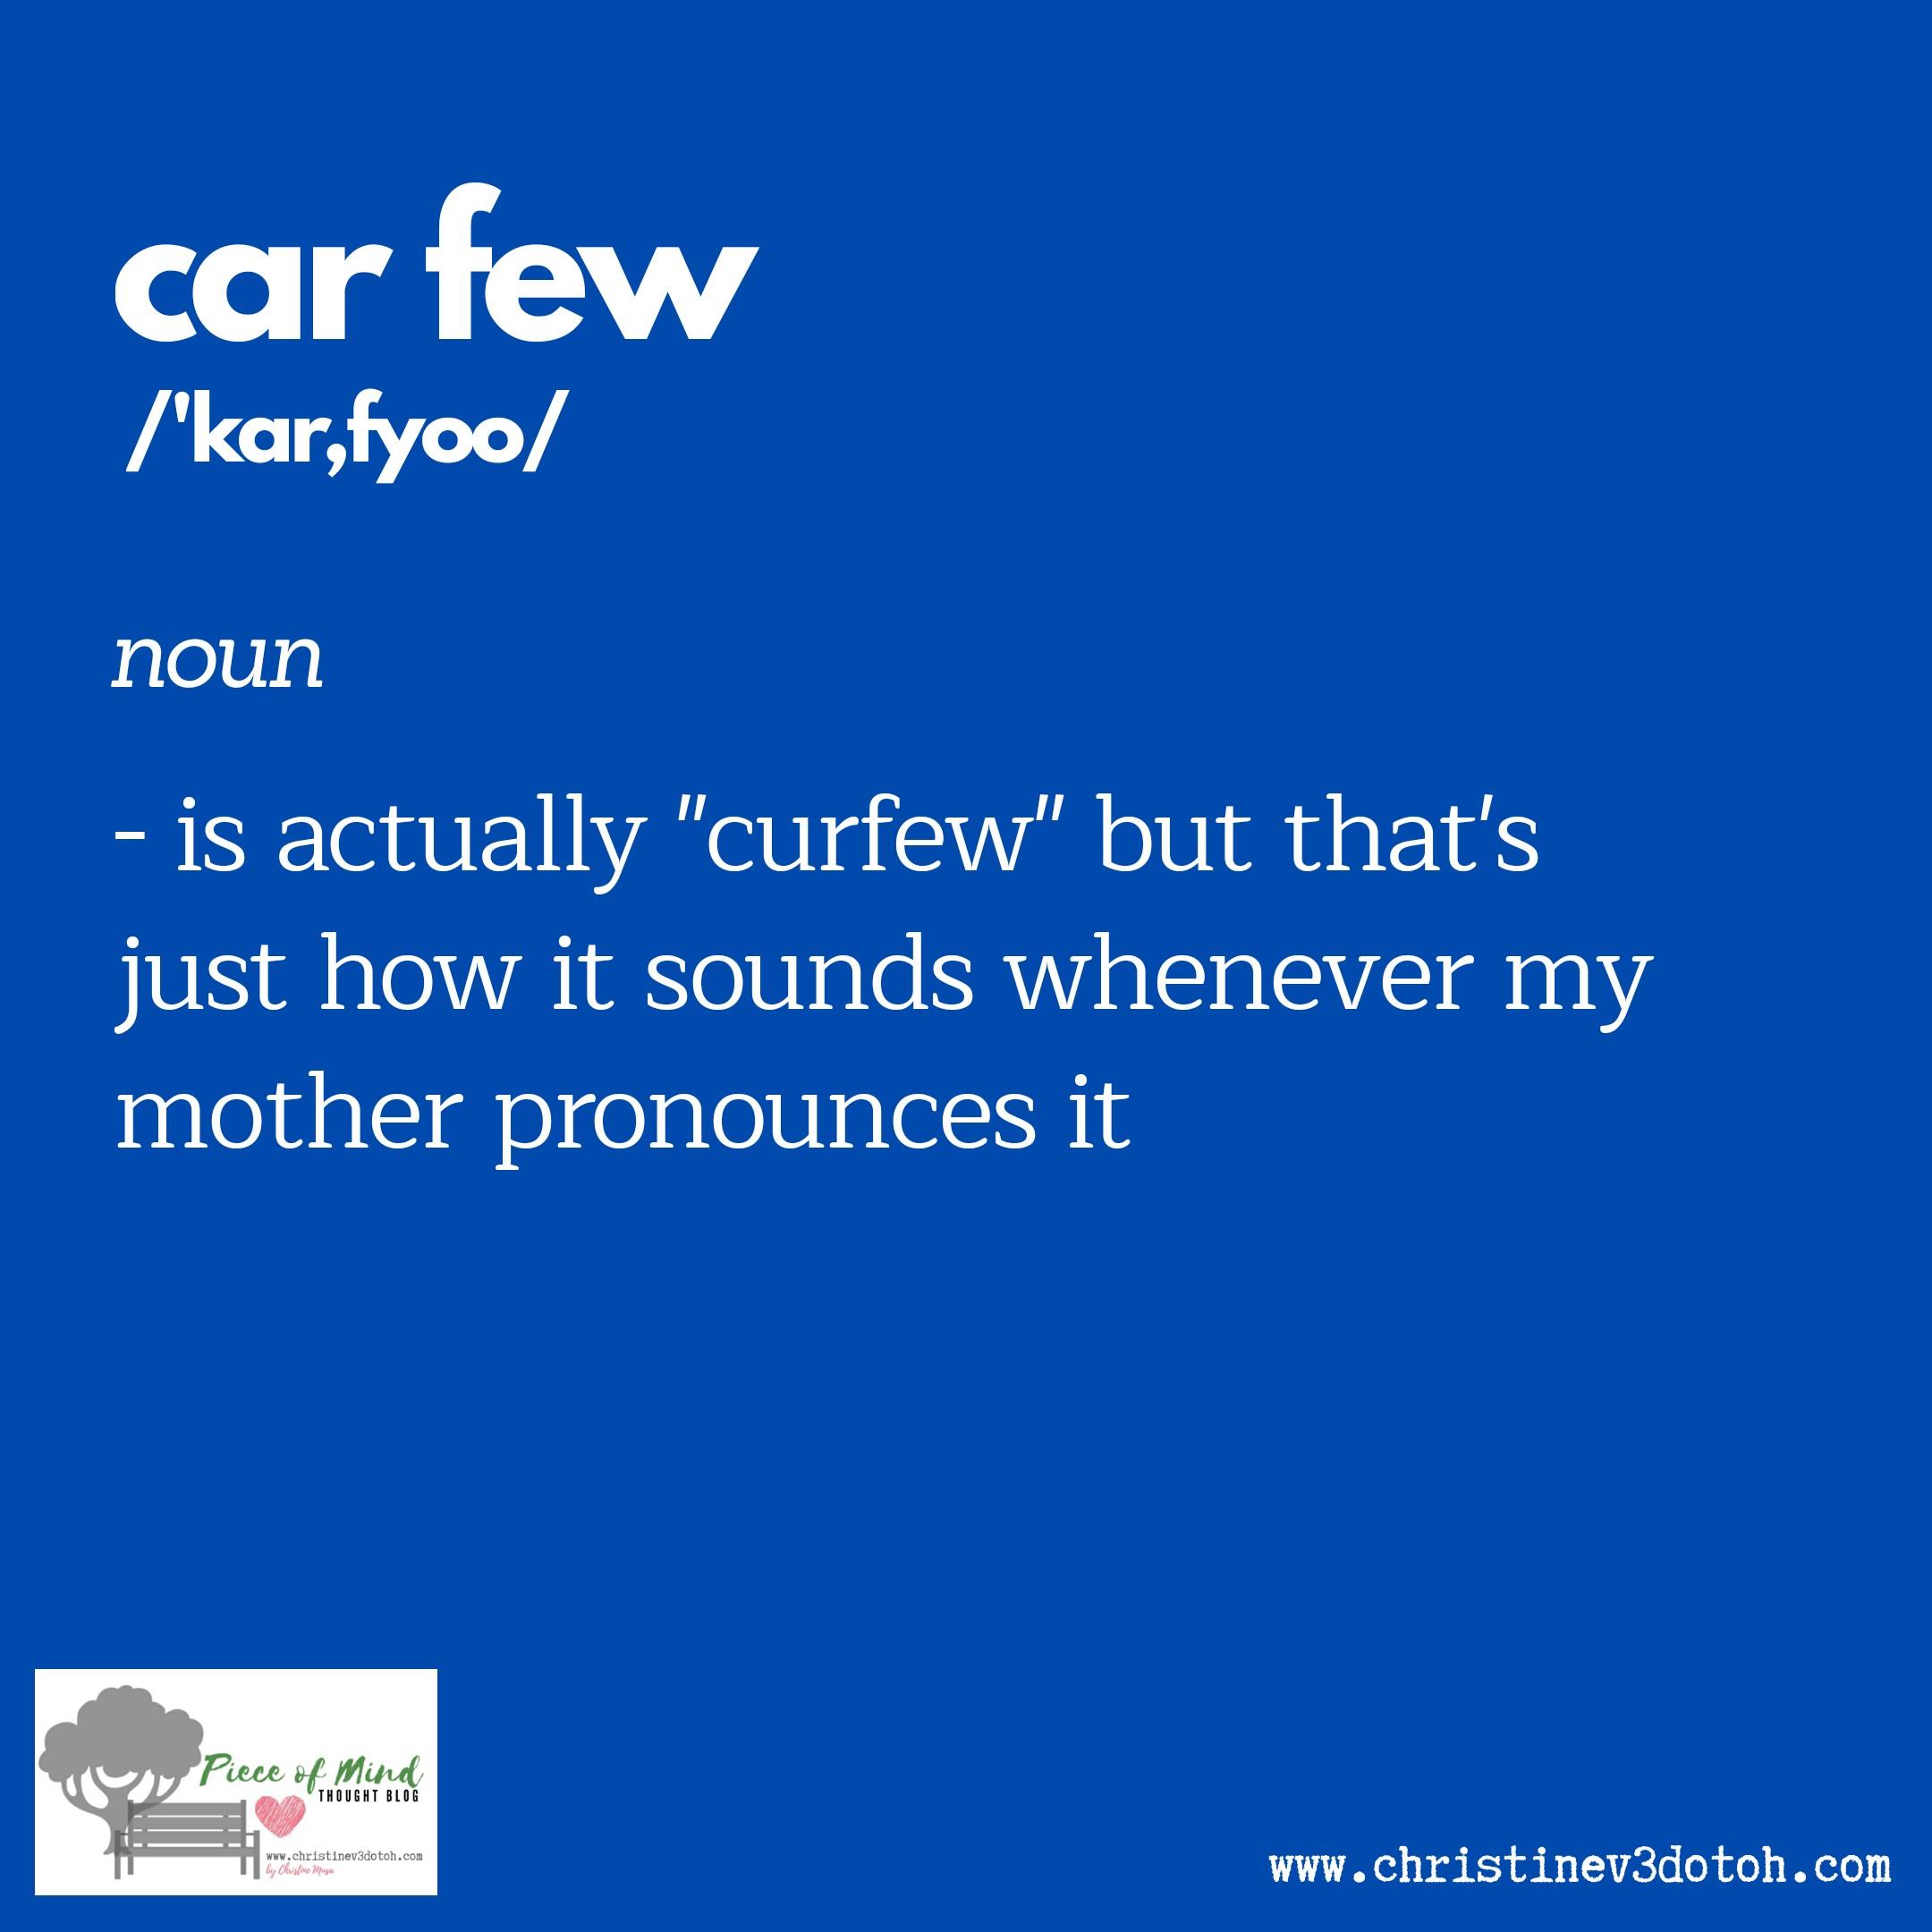 40.-What-is-Car-Few